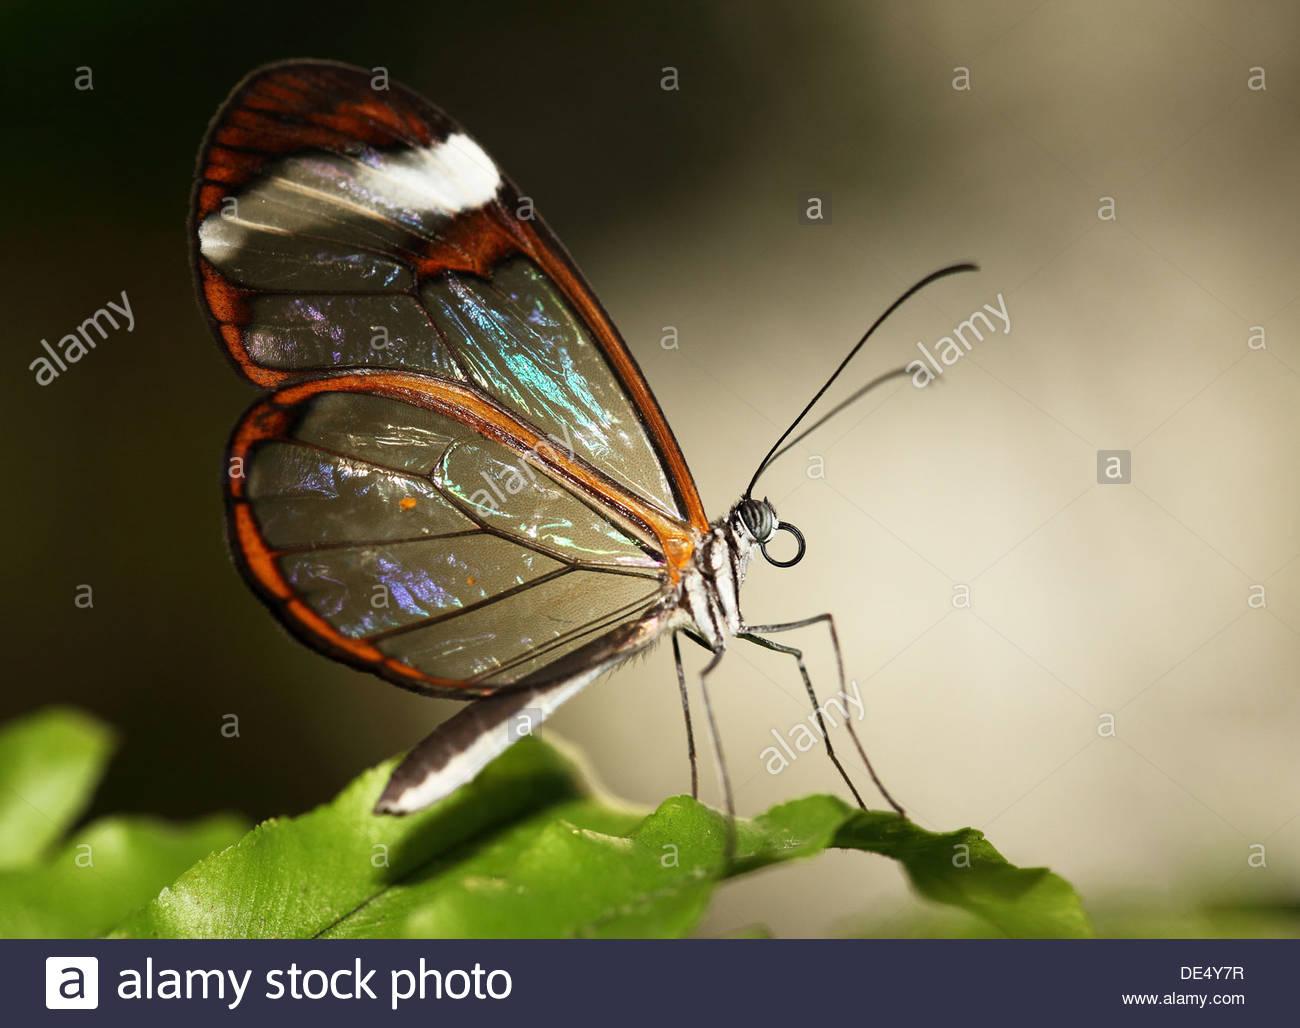 Glasswinged farfalle tropicali Immagini Stock